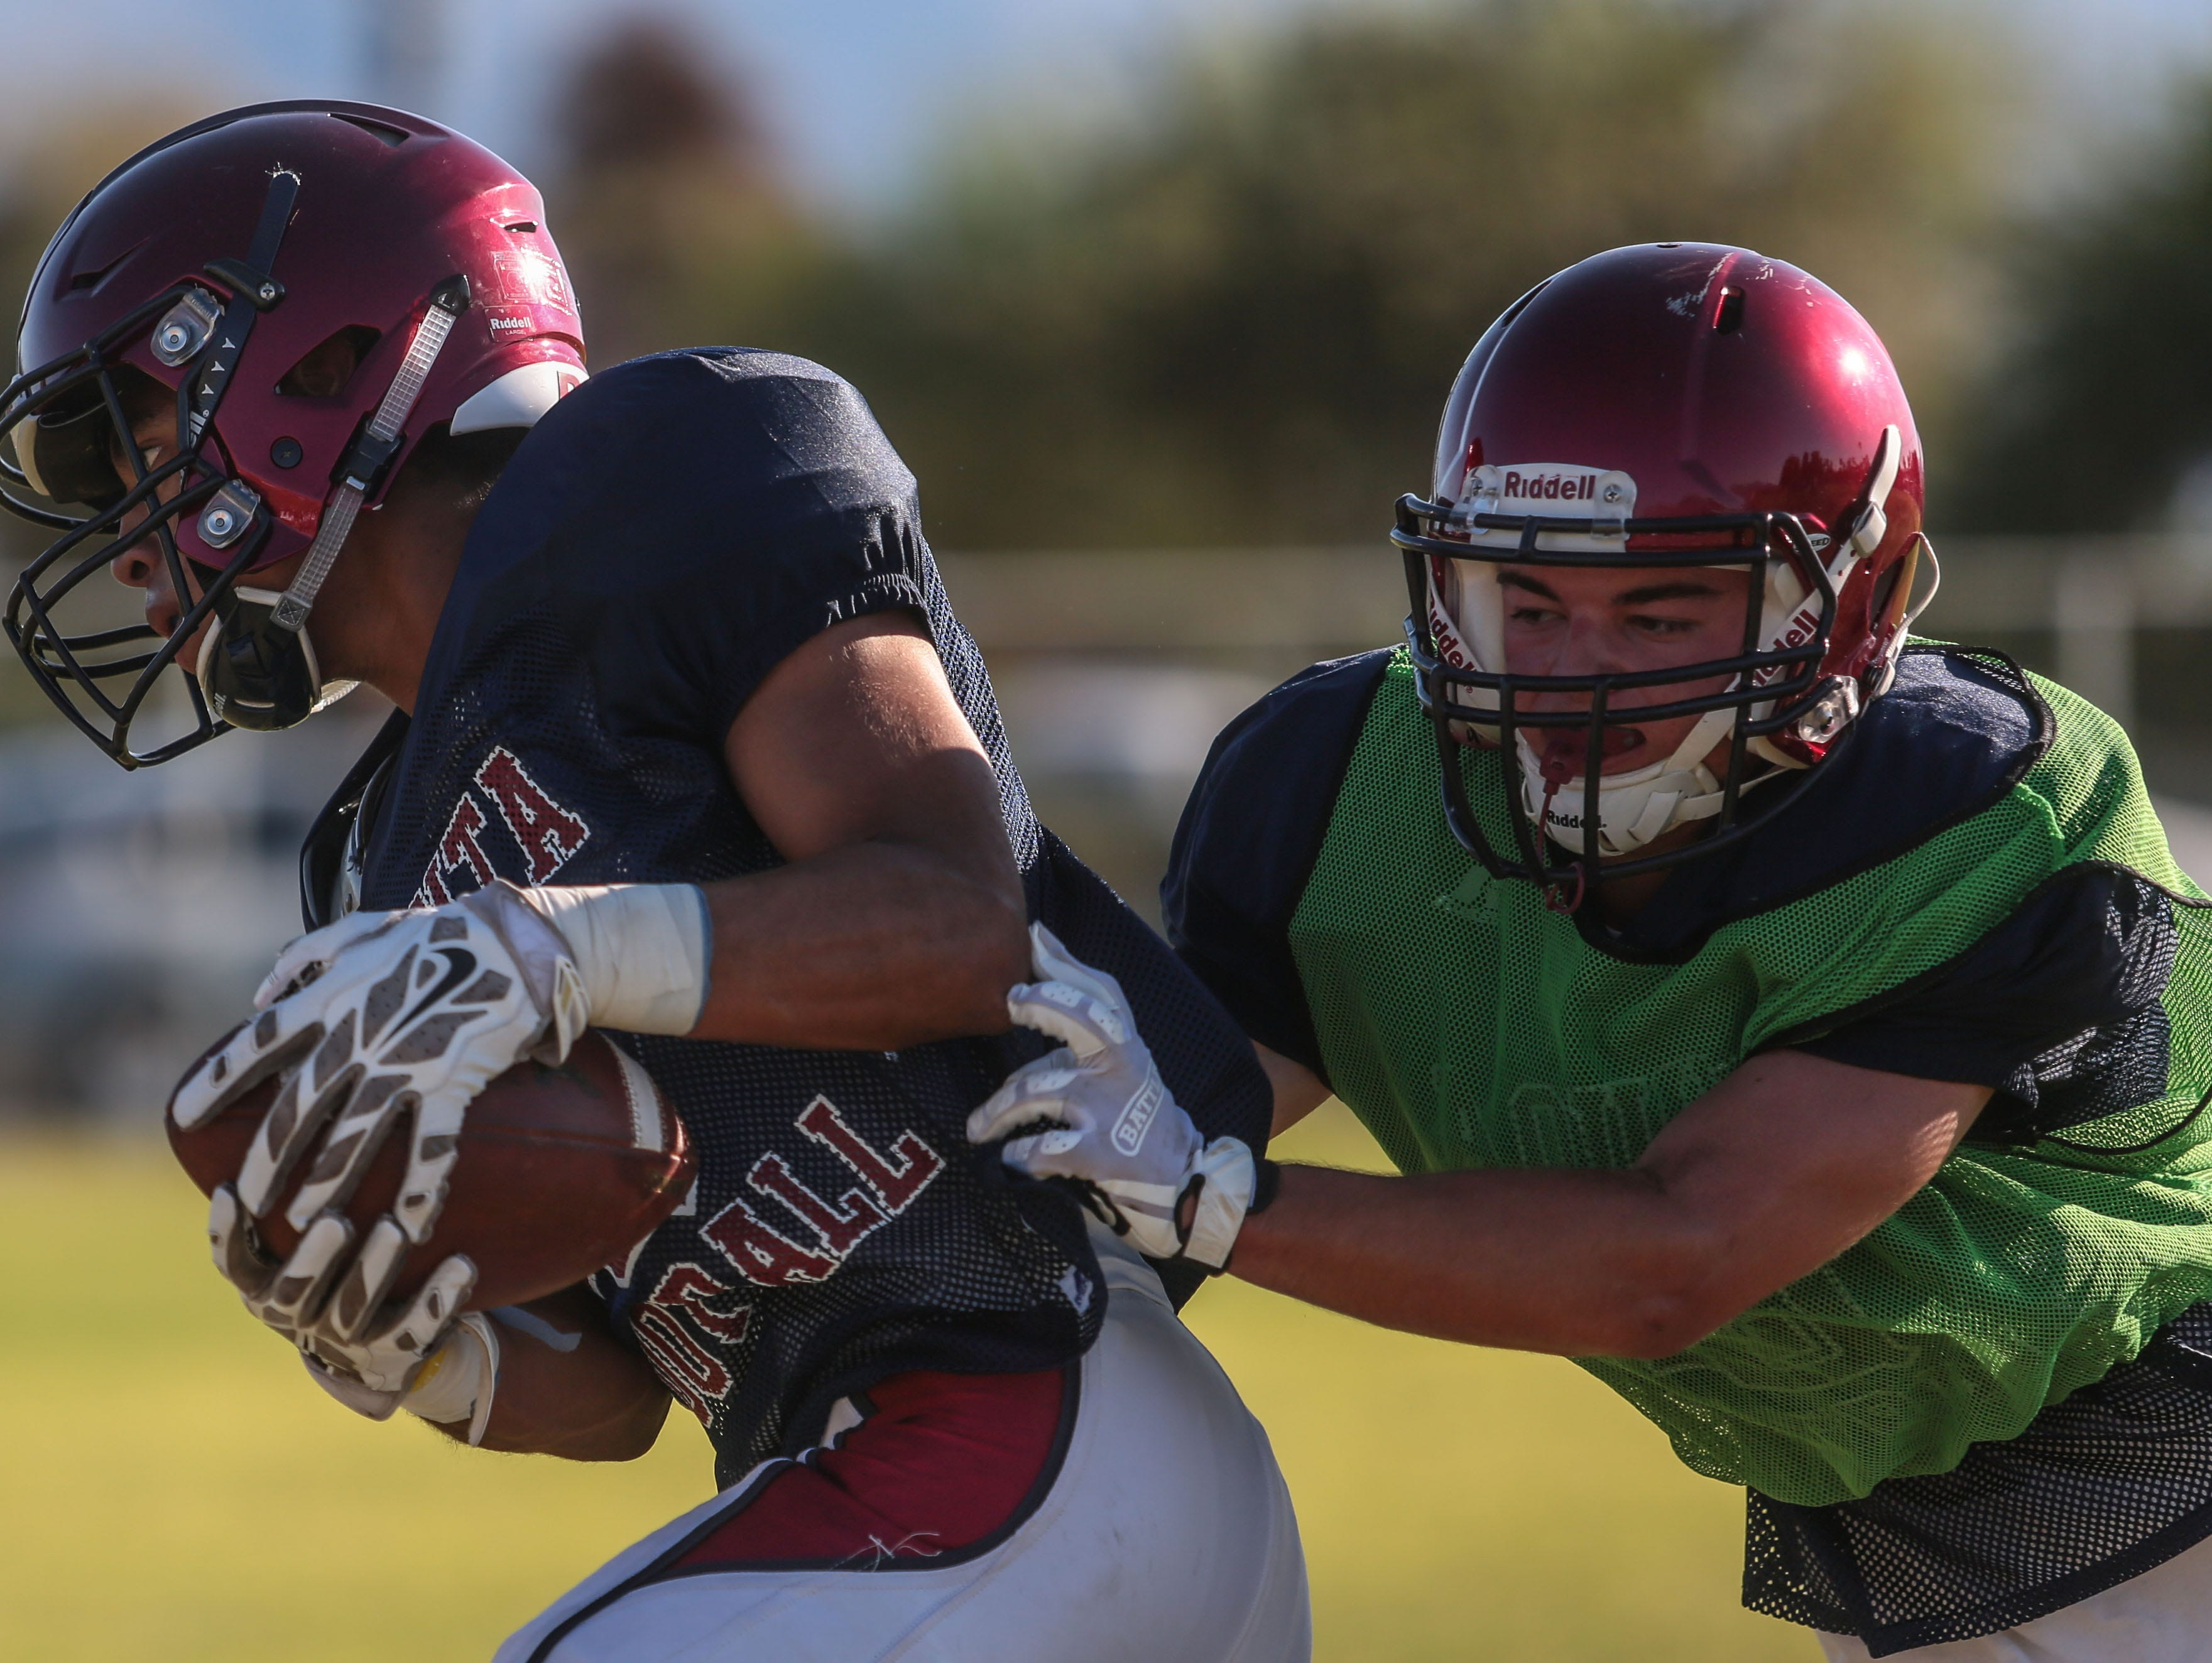 The La Quinta football team practice on Tuesday, August 16, 2016 in La Quinta.